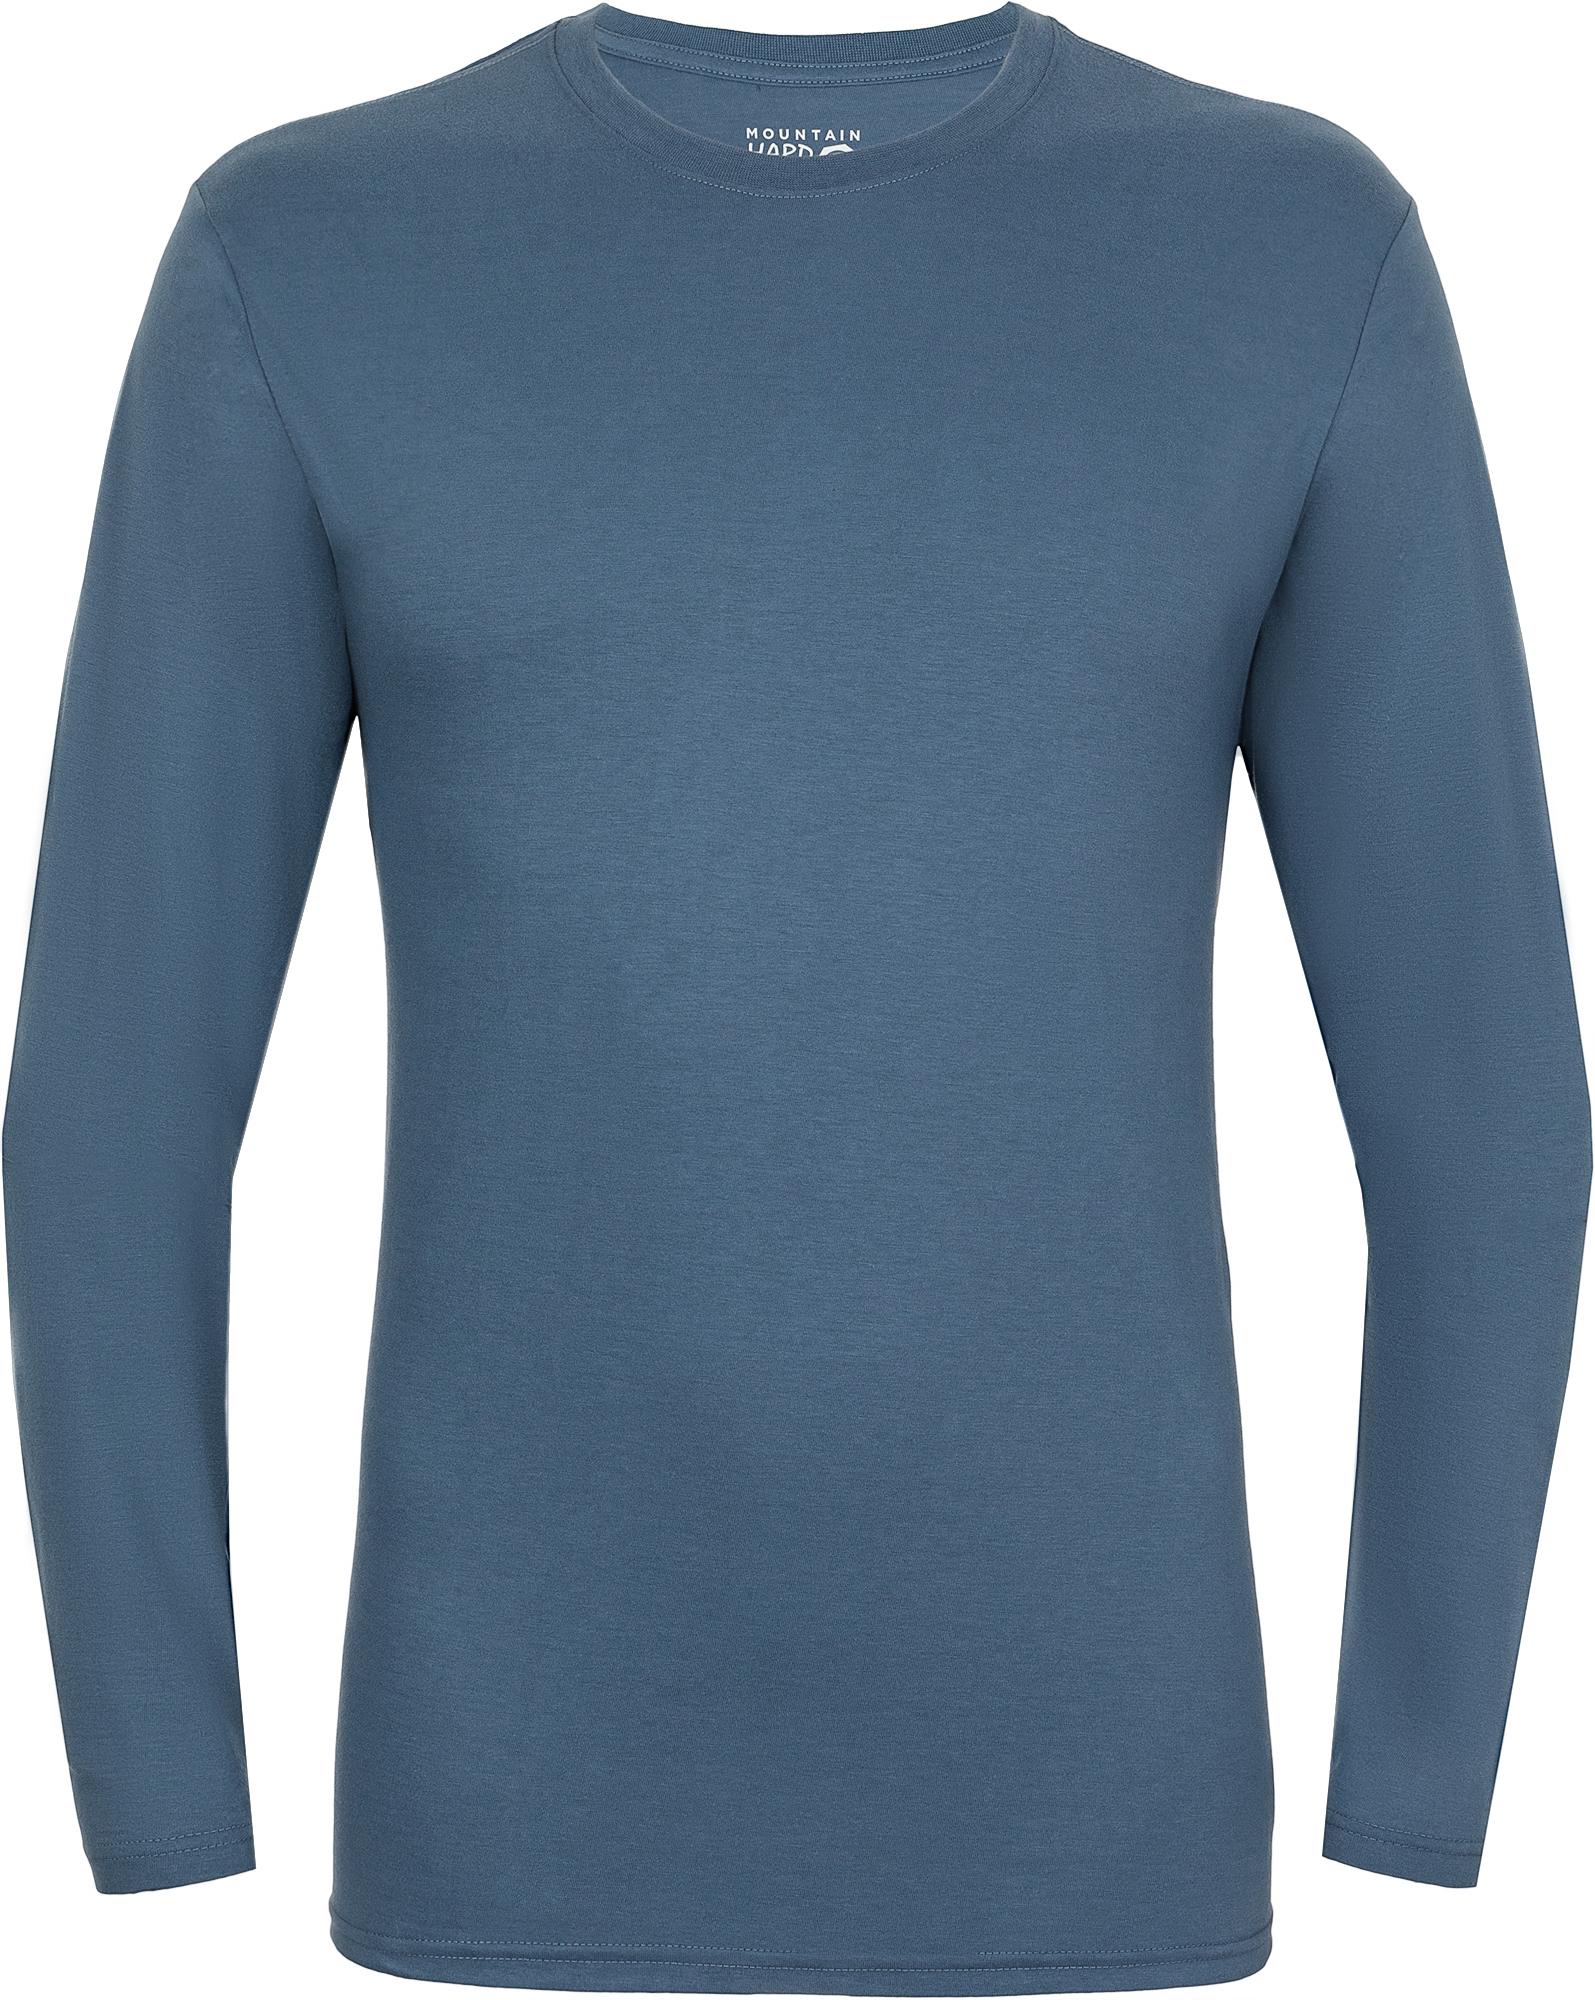 цена на Mountain Hardwear Лонгслив мужской Mountain Hardwear Vertical Oriented™, размер 54